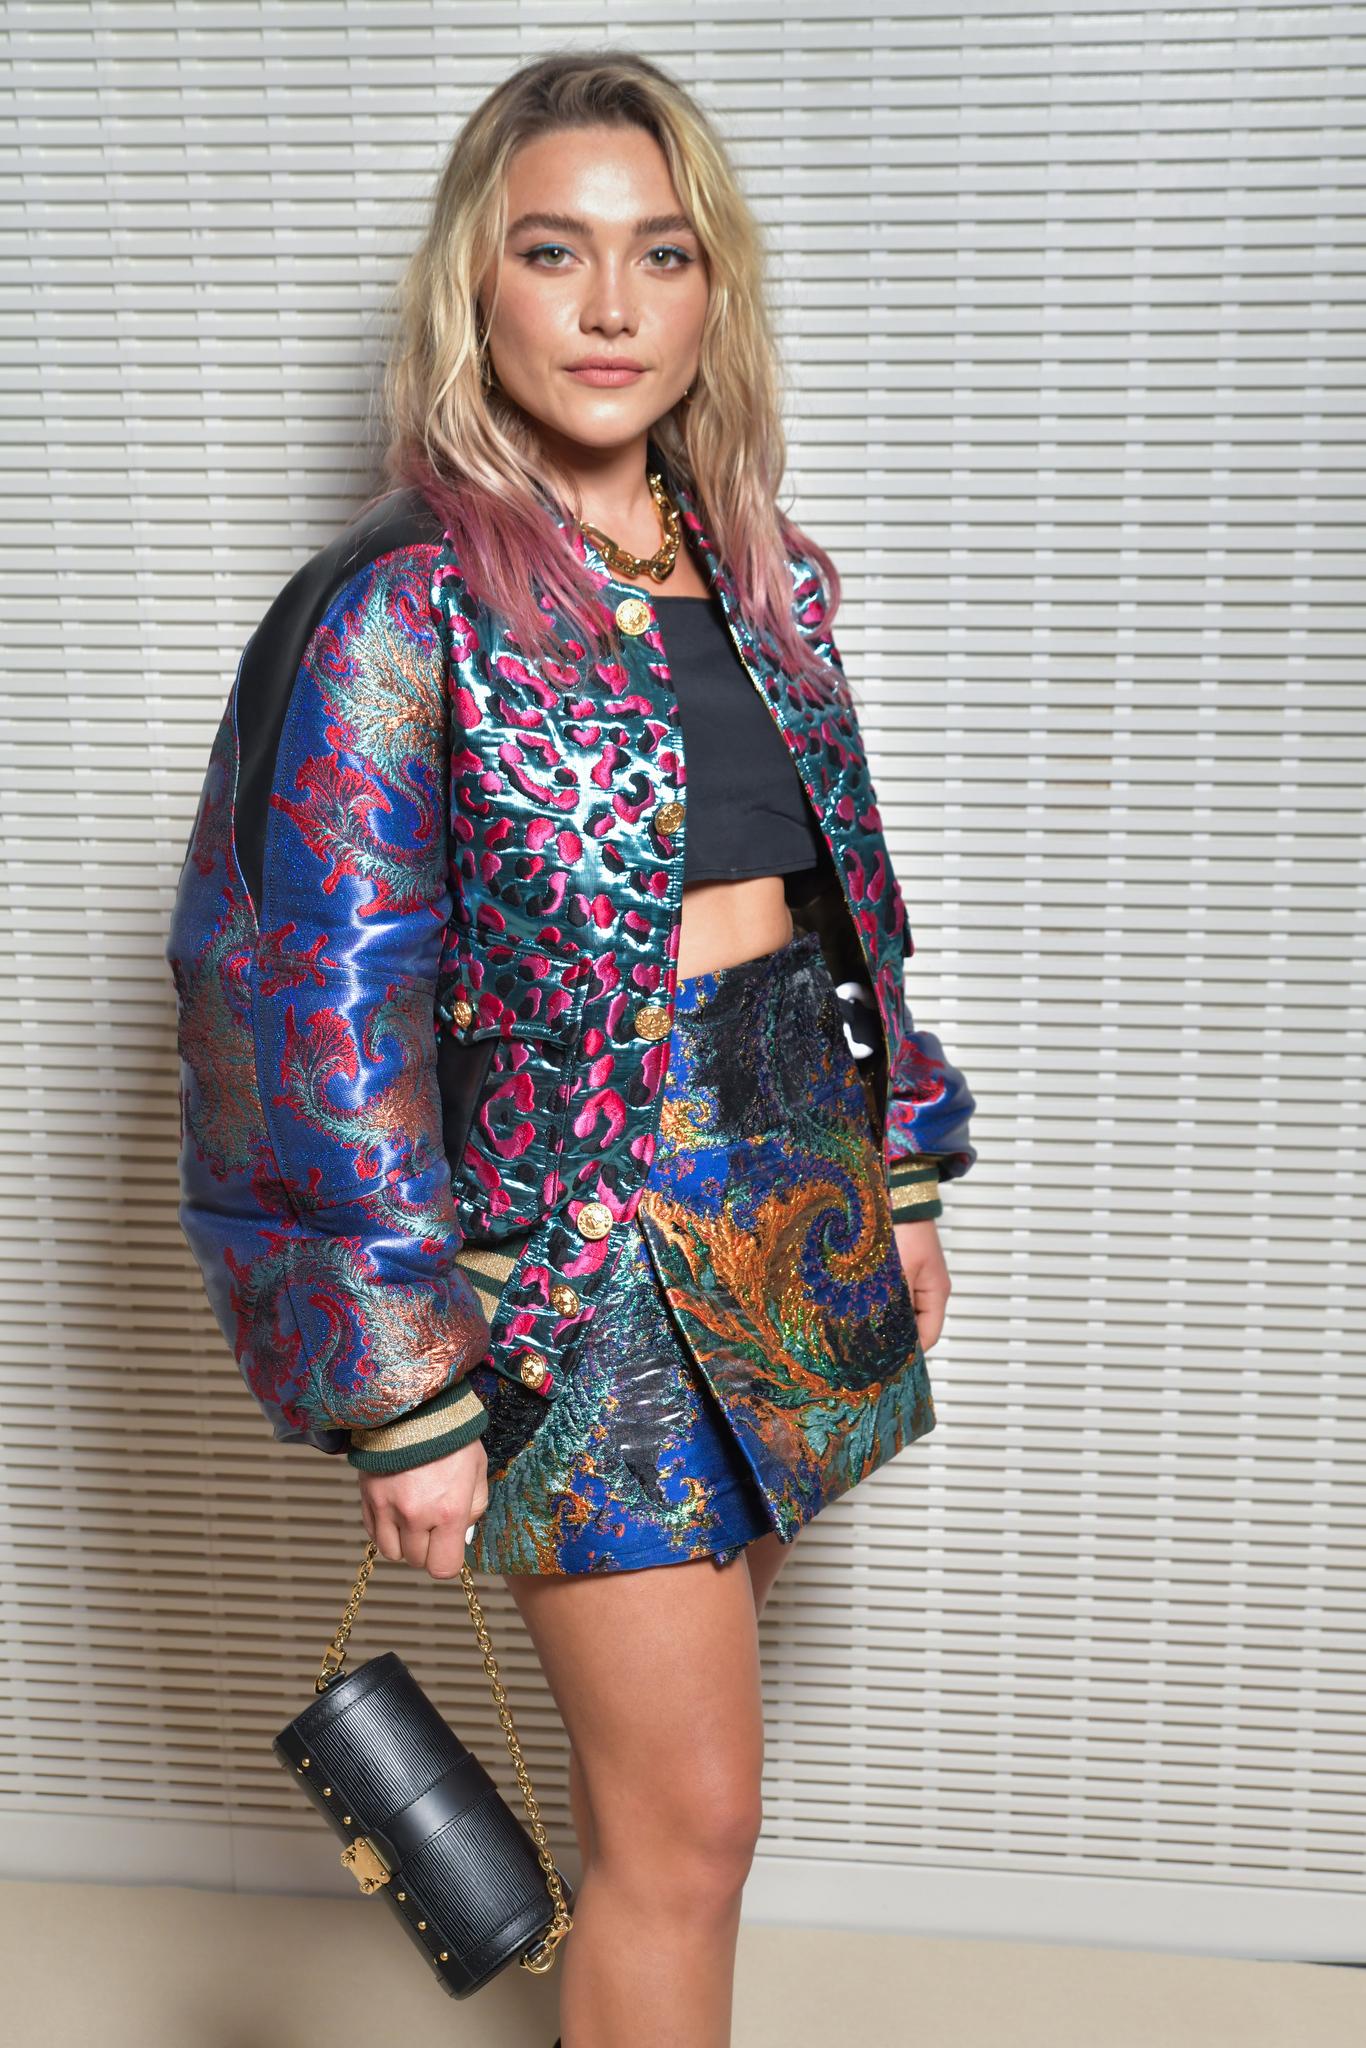 Louis Vuitton Couture Fall 2021